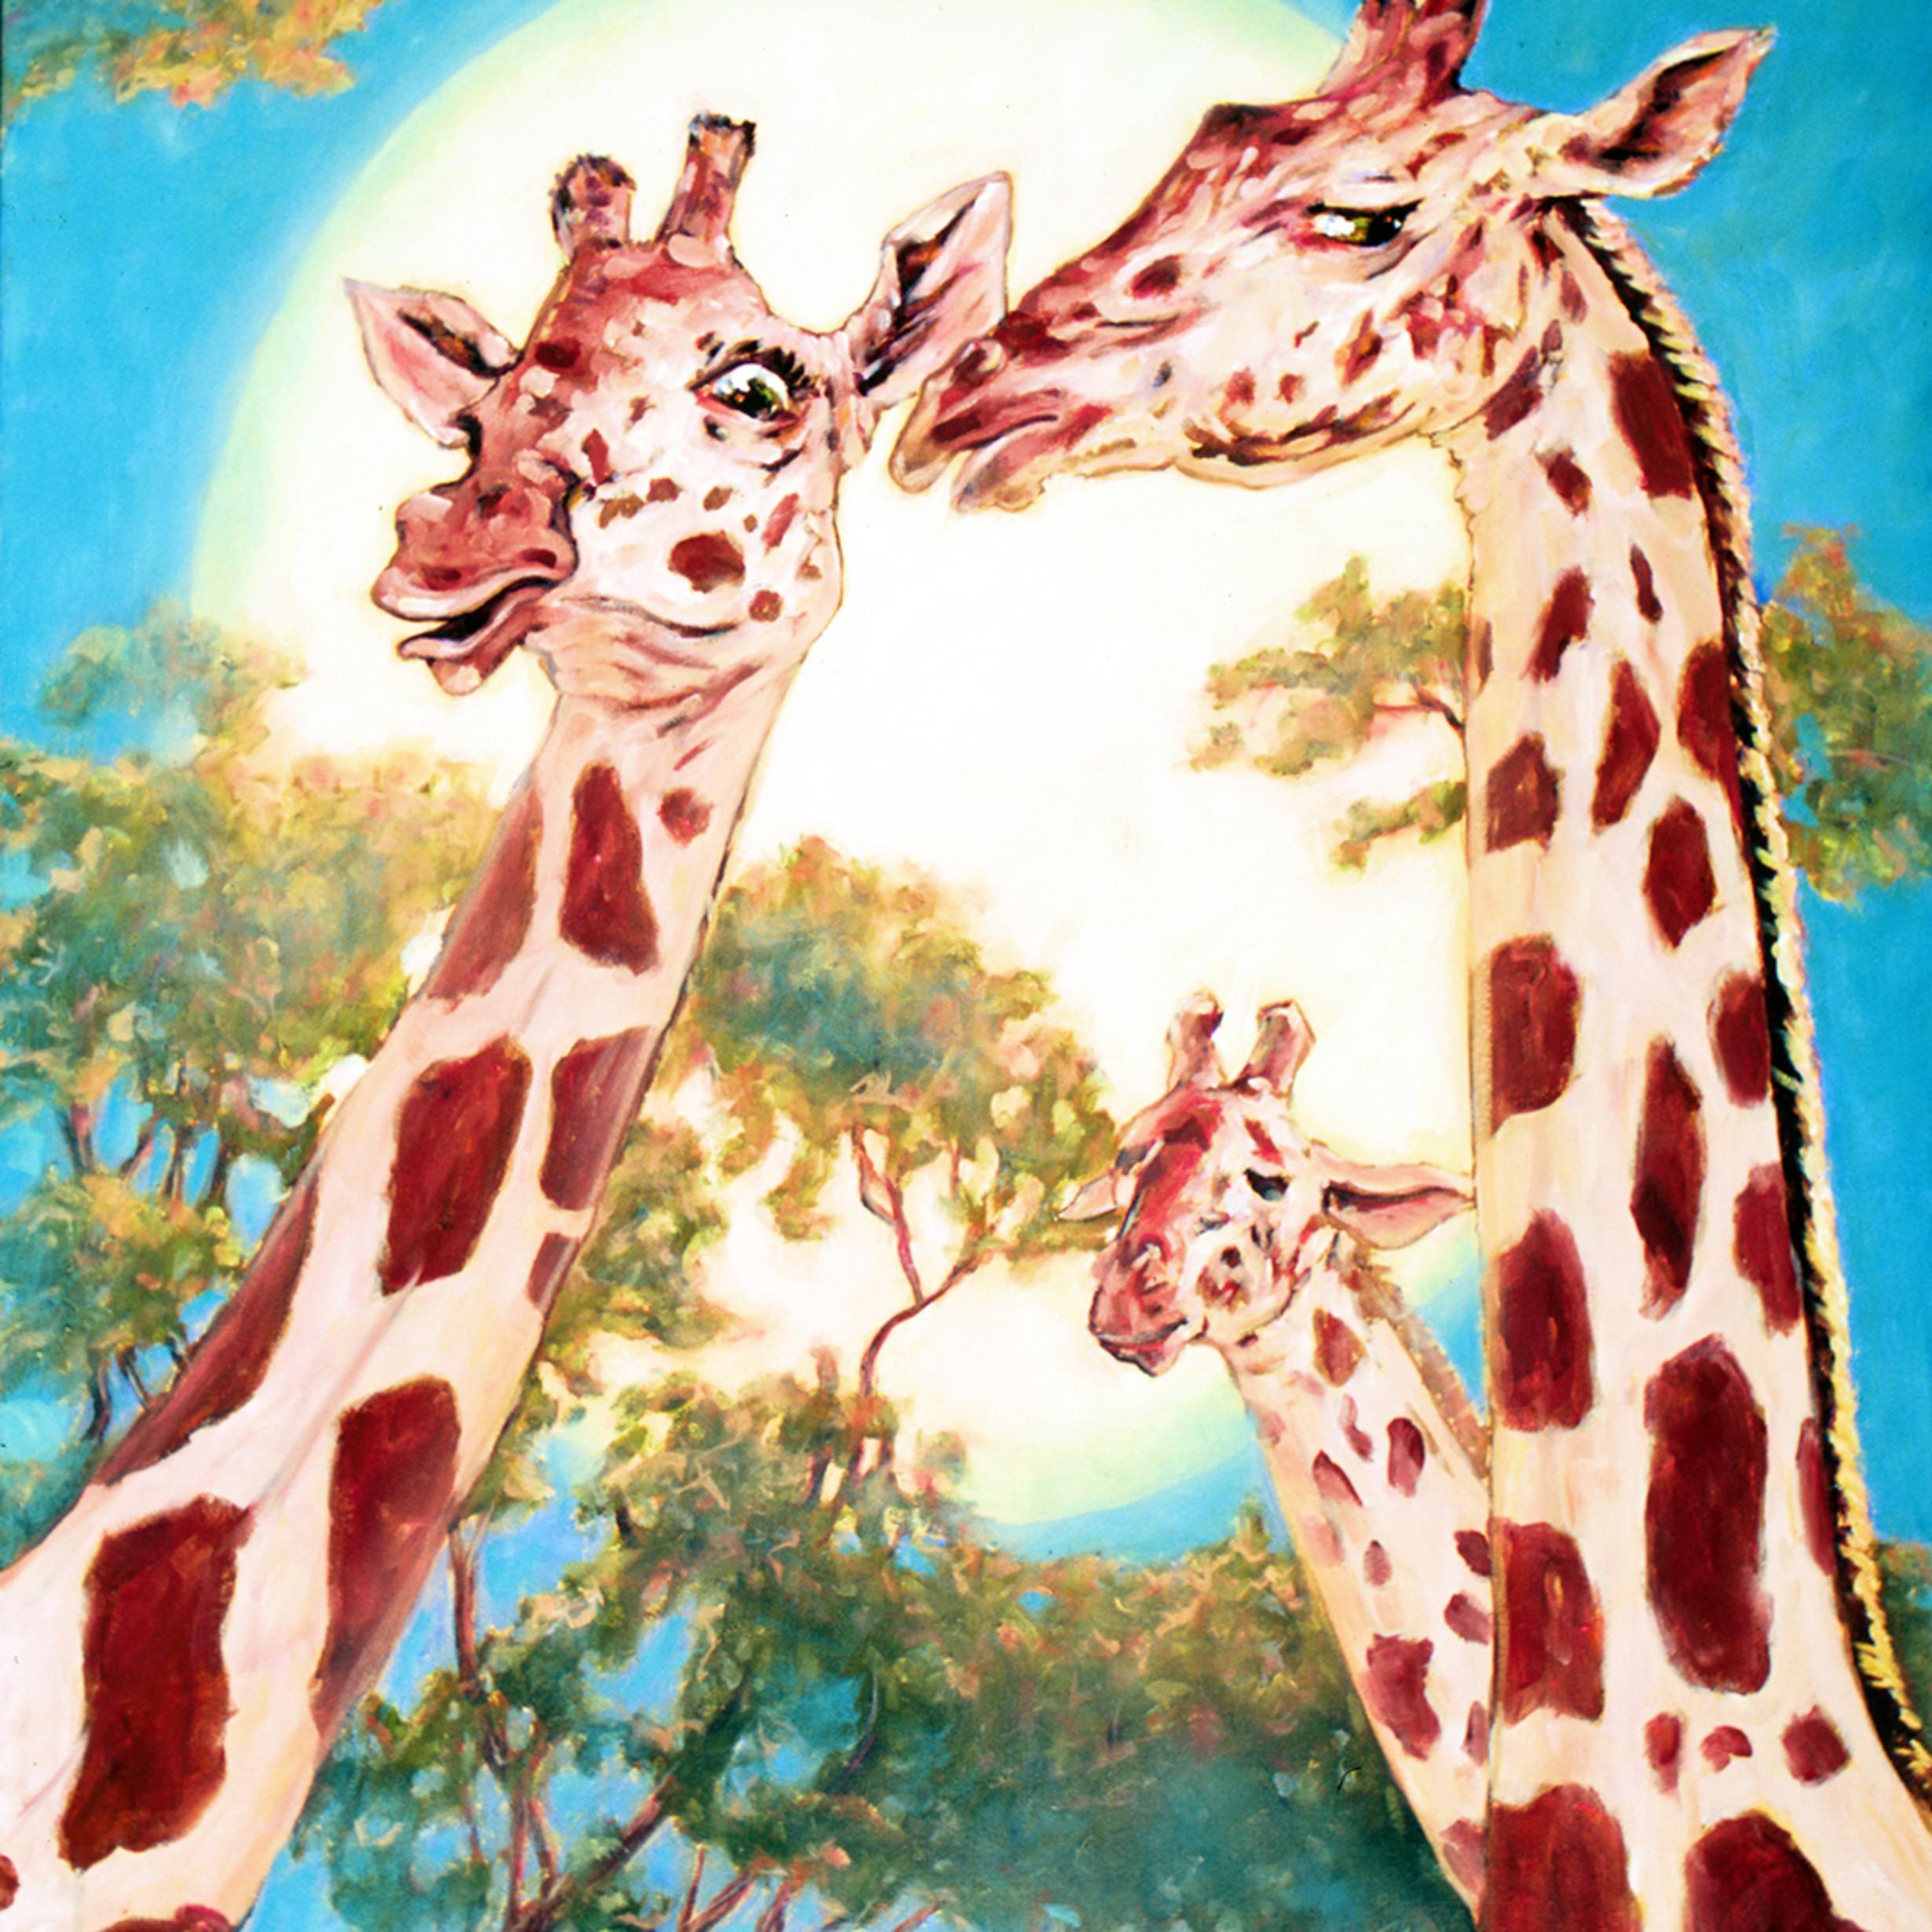 G is for gossiping giraffes zpywkq